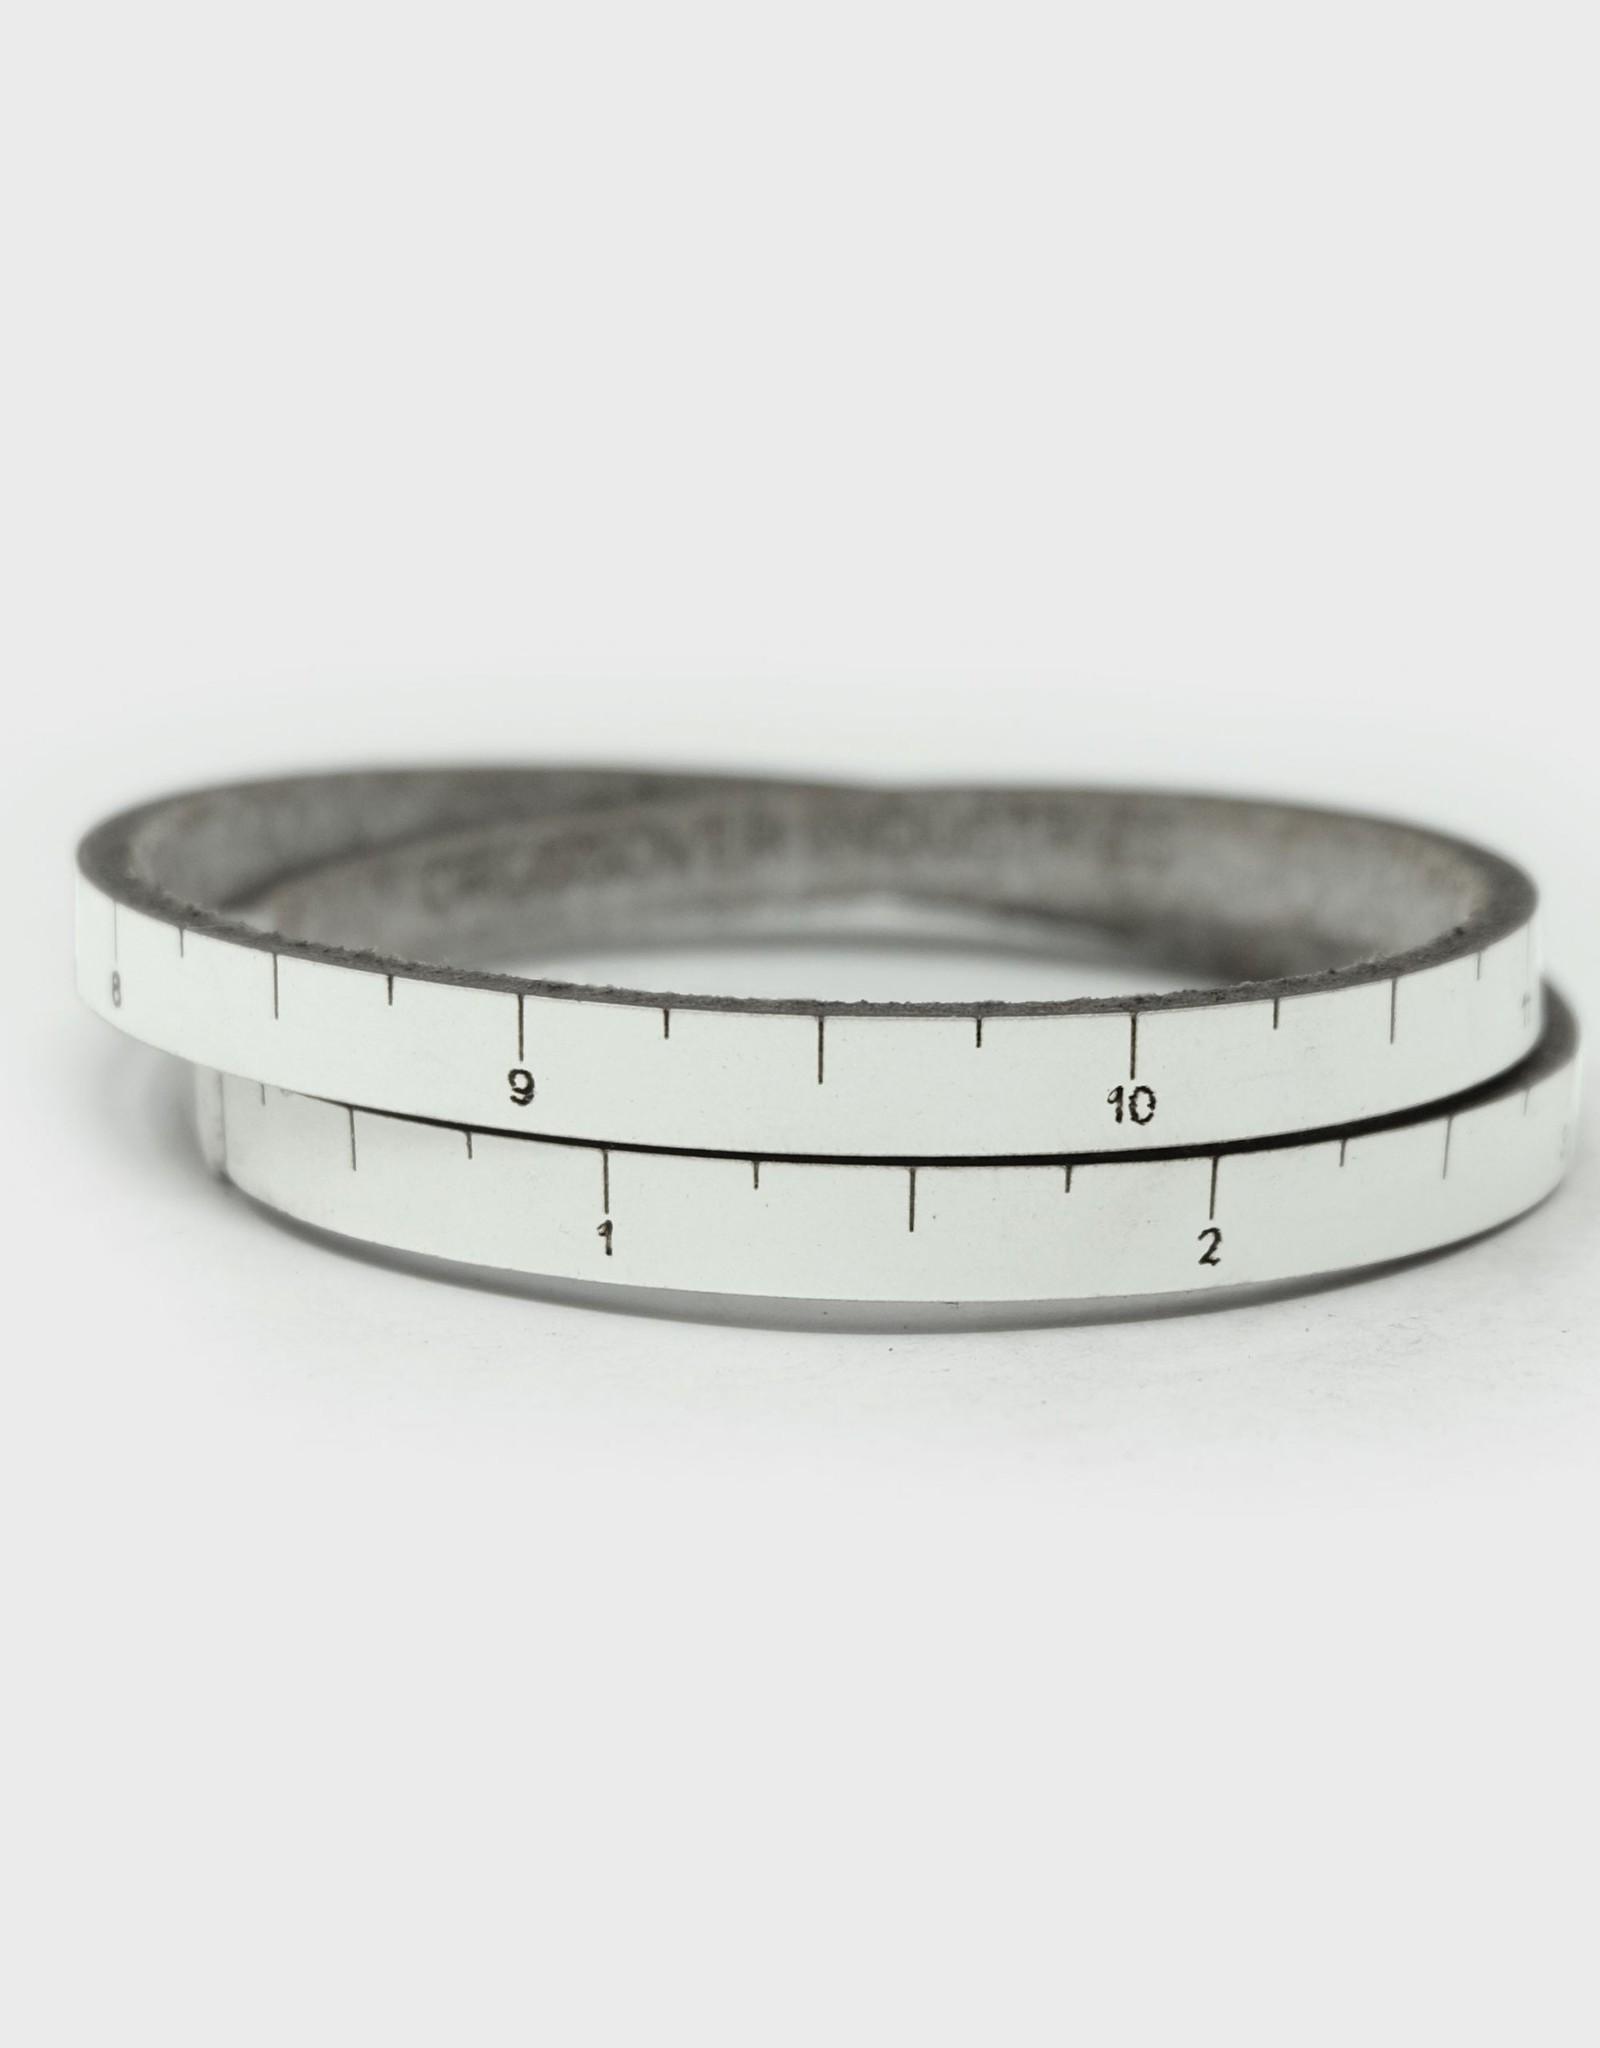 ILOVEHANDLES Thinline Wrist Ruler